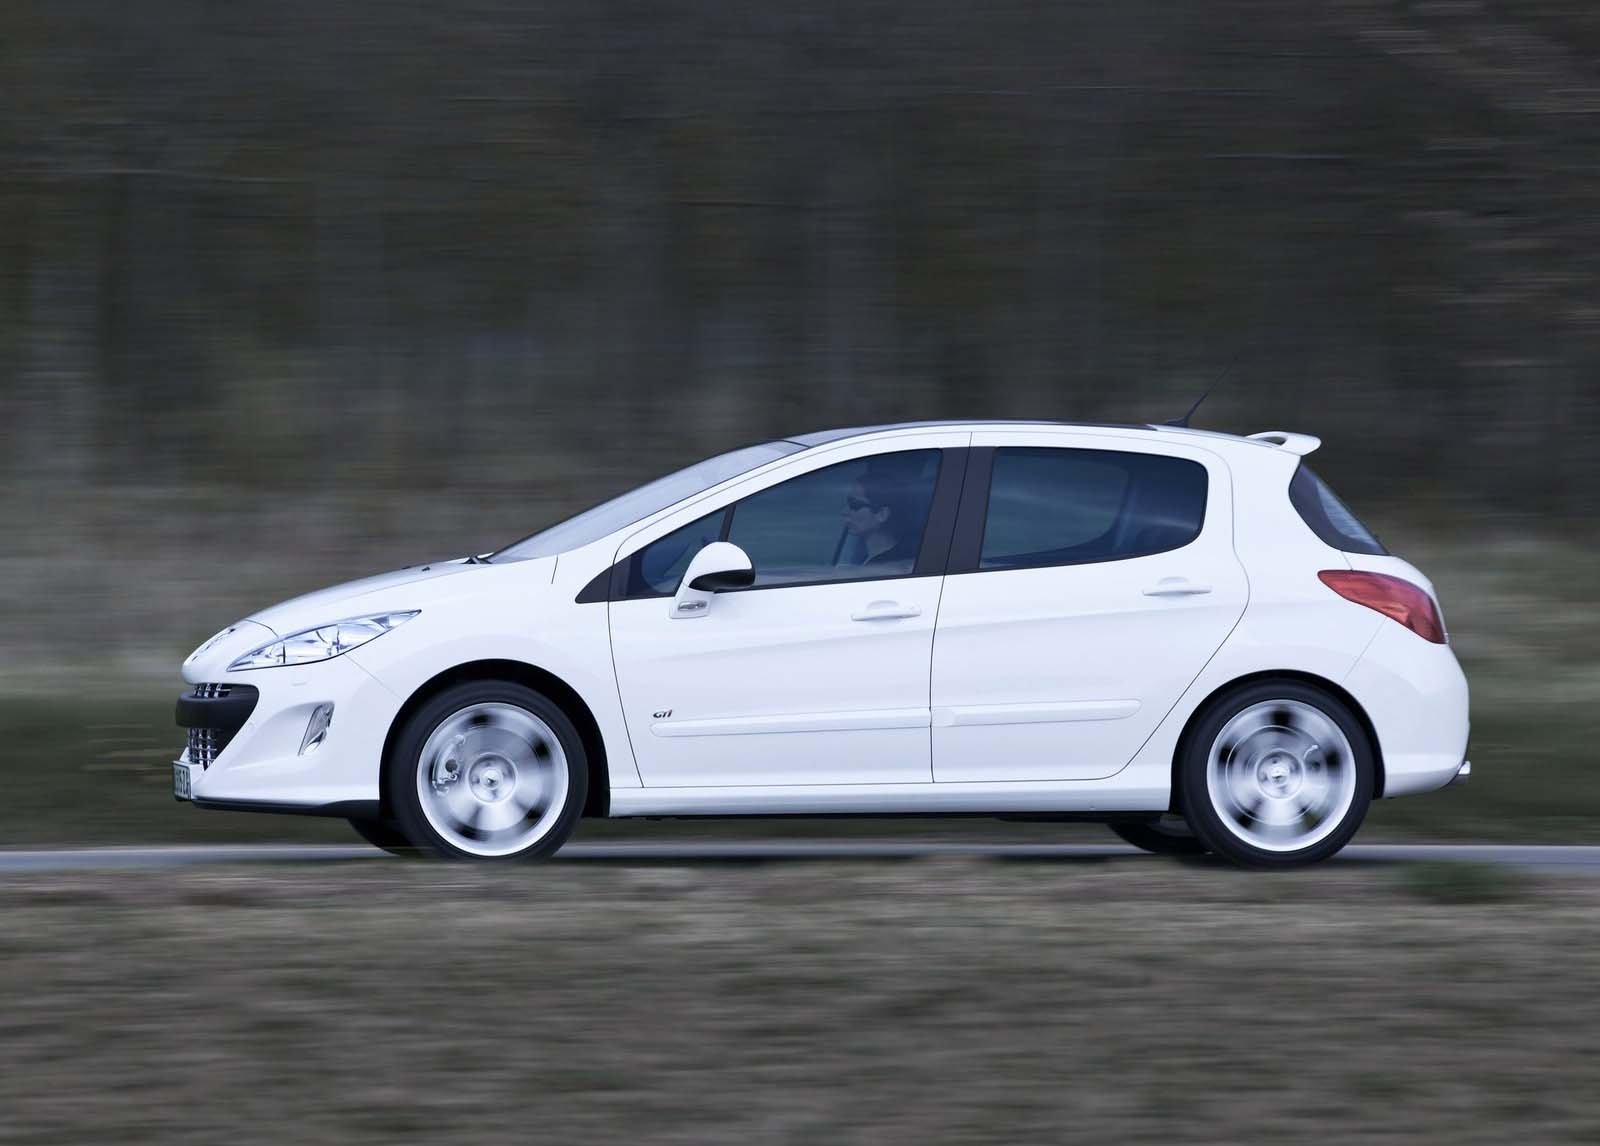 http://2.bp.blogspot.com/_FpC-eLEpDtM/TAuy6osG_CI/AAAAAAAAdlQ/yRHBGllVE-Y/s1600/Peugeot_308_GTi_2011_4_topcarpsuperos.blogspot.com.jpg